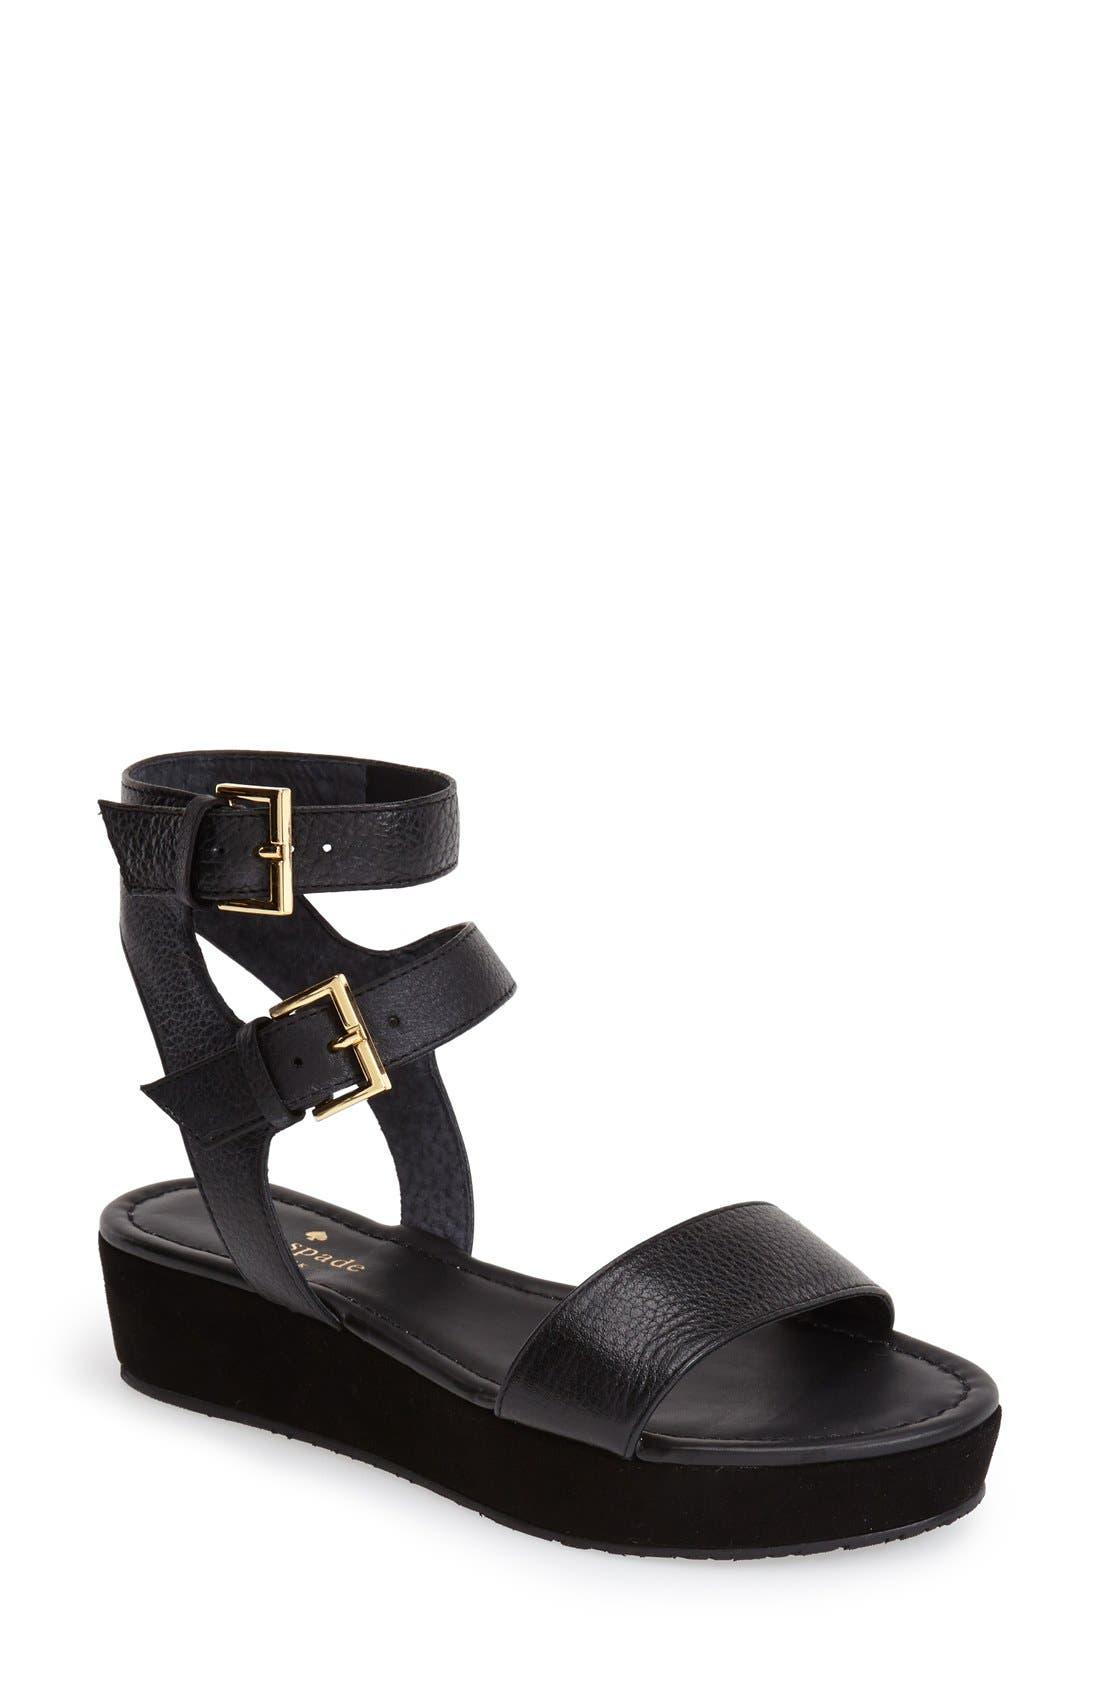 Main Image - kate spade new york 'troy' platform sandal (Women)